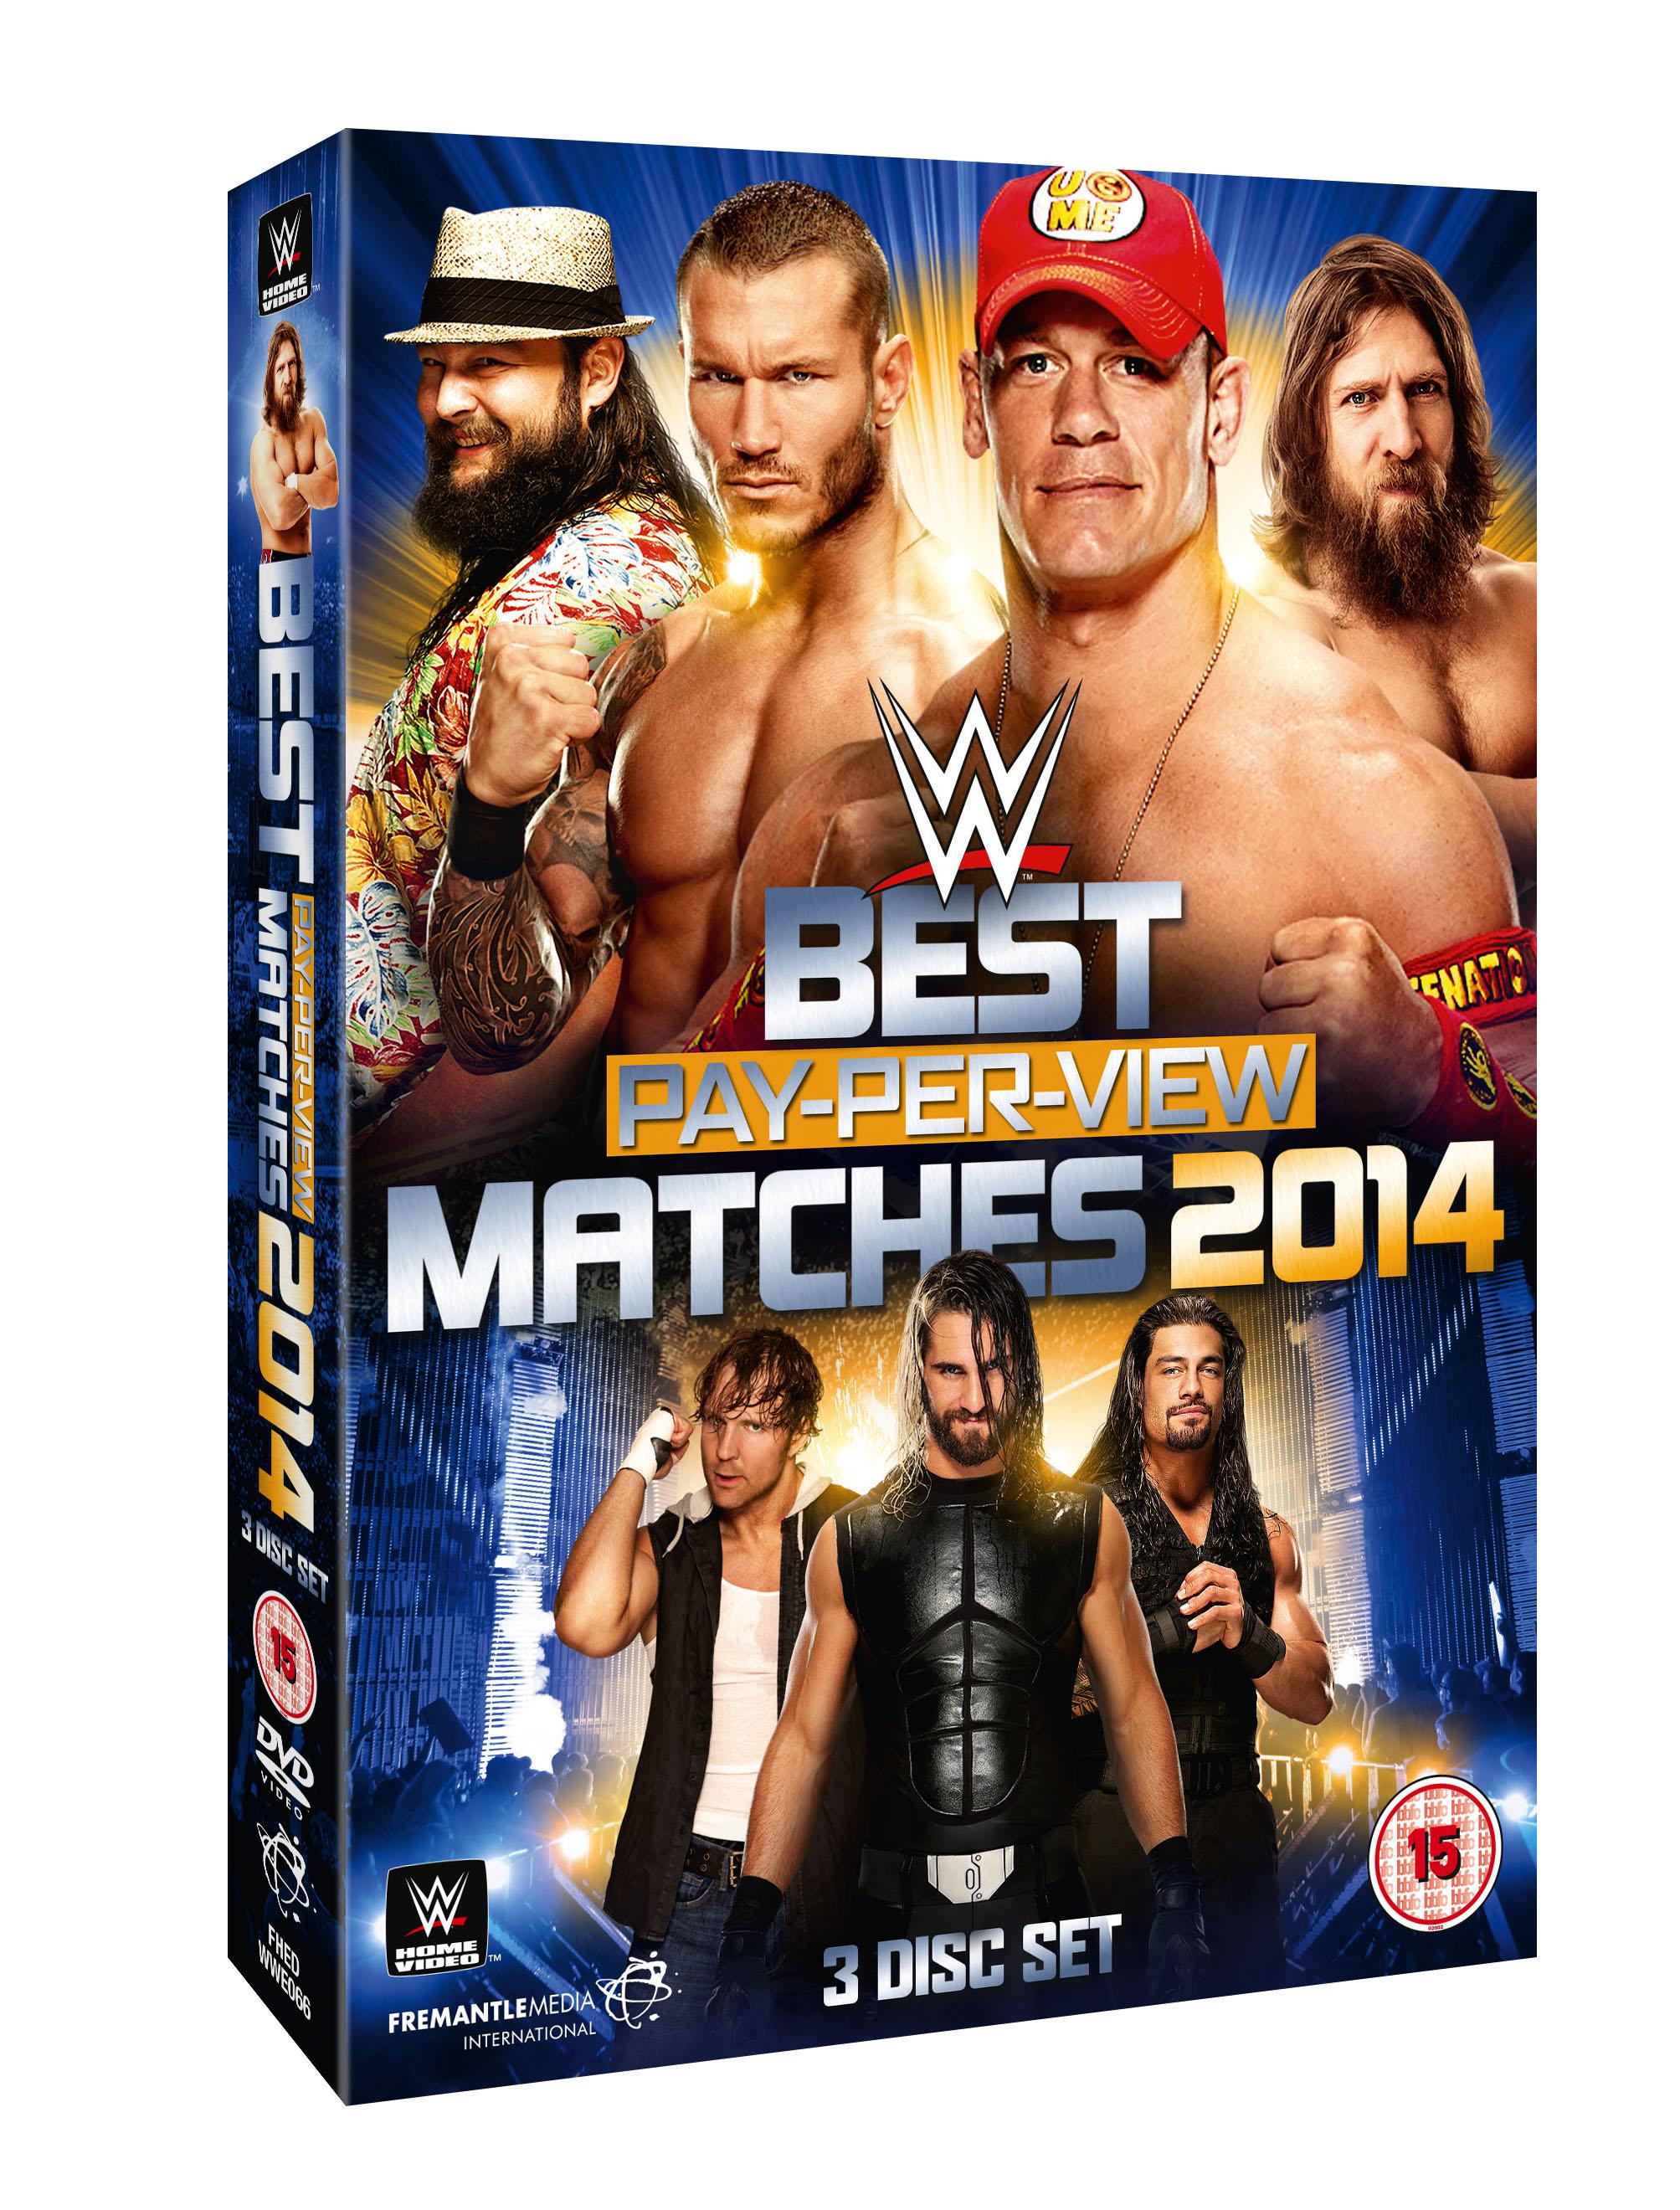 Wwe best matches dvd : Madhubala ek ishq ek junoon 15